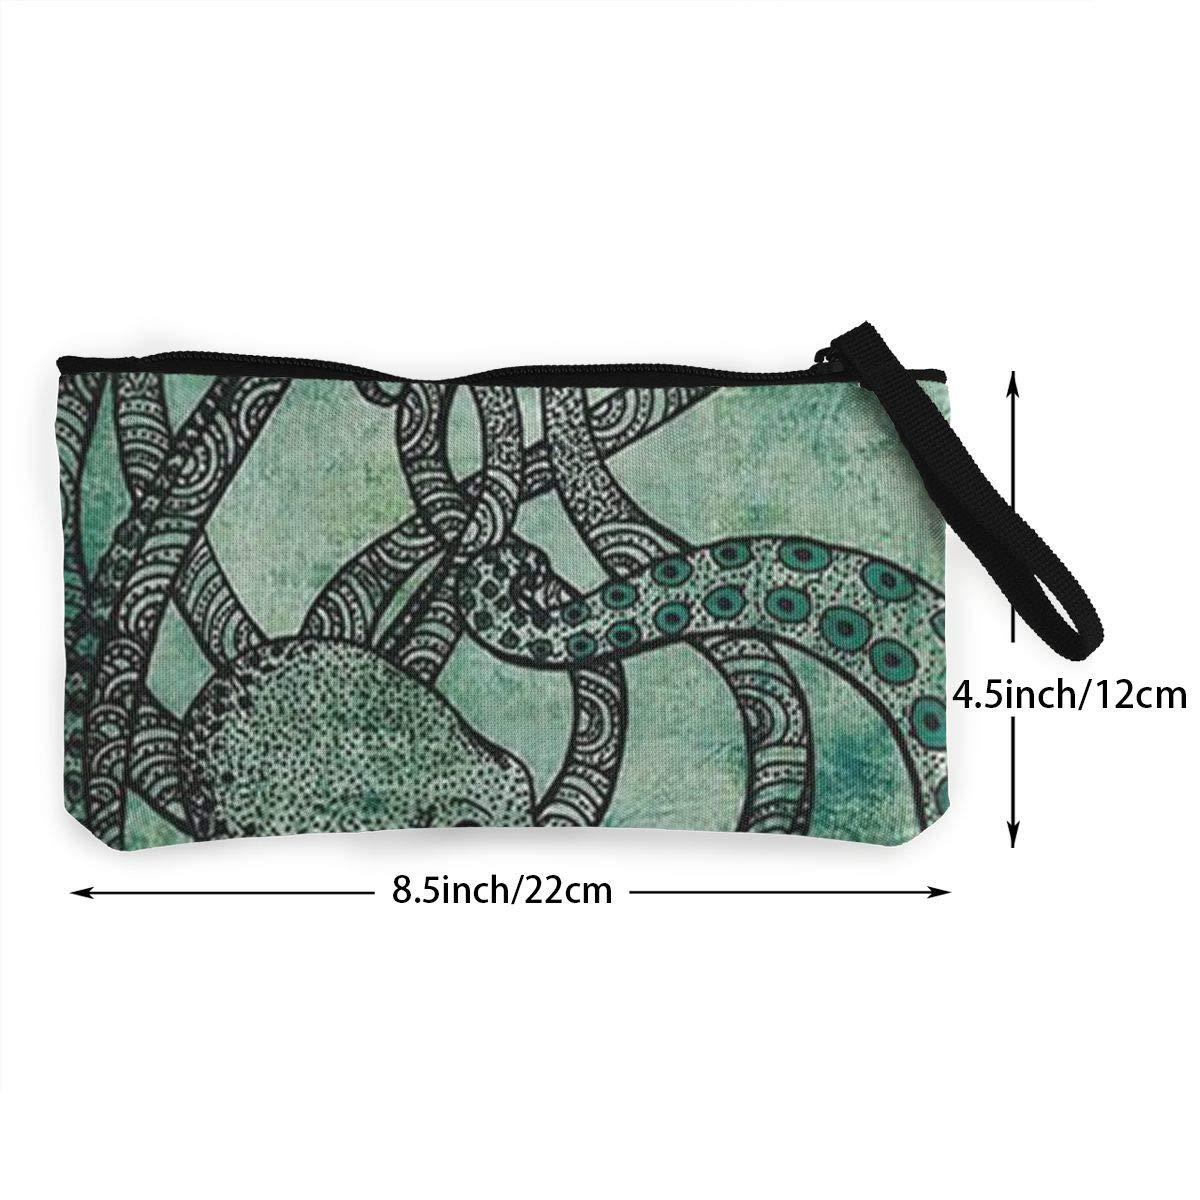 Canvas Cash Coin Purse,Green Octopus Print Make Up Bag Zipper Small Purse Wallets